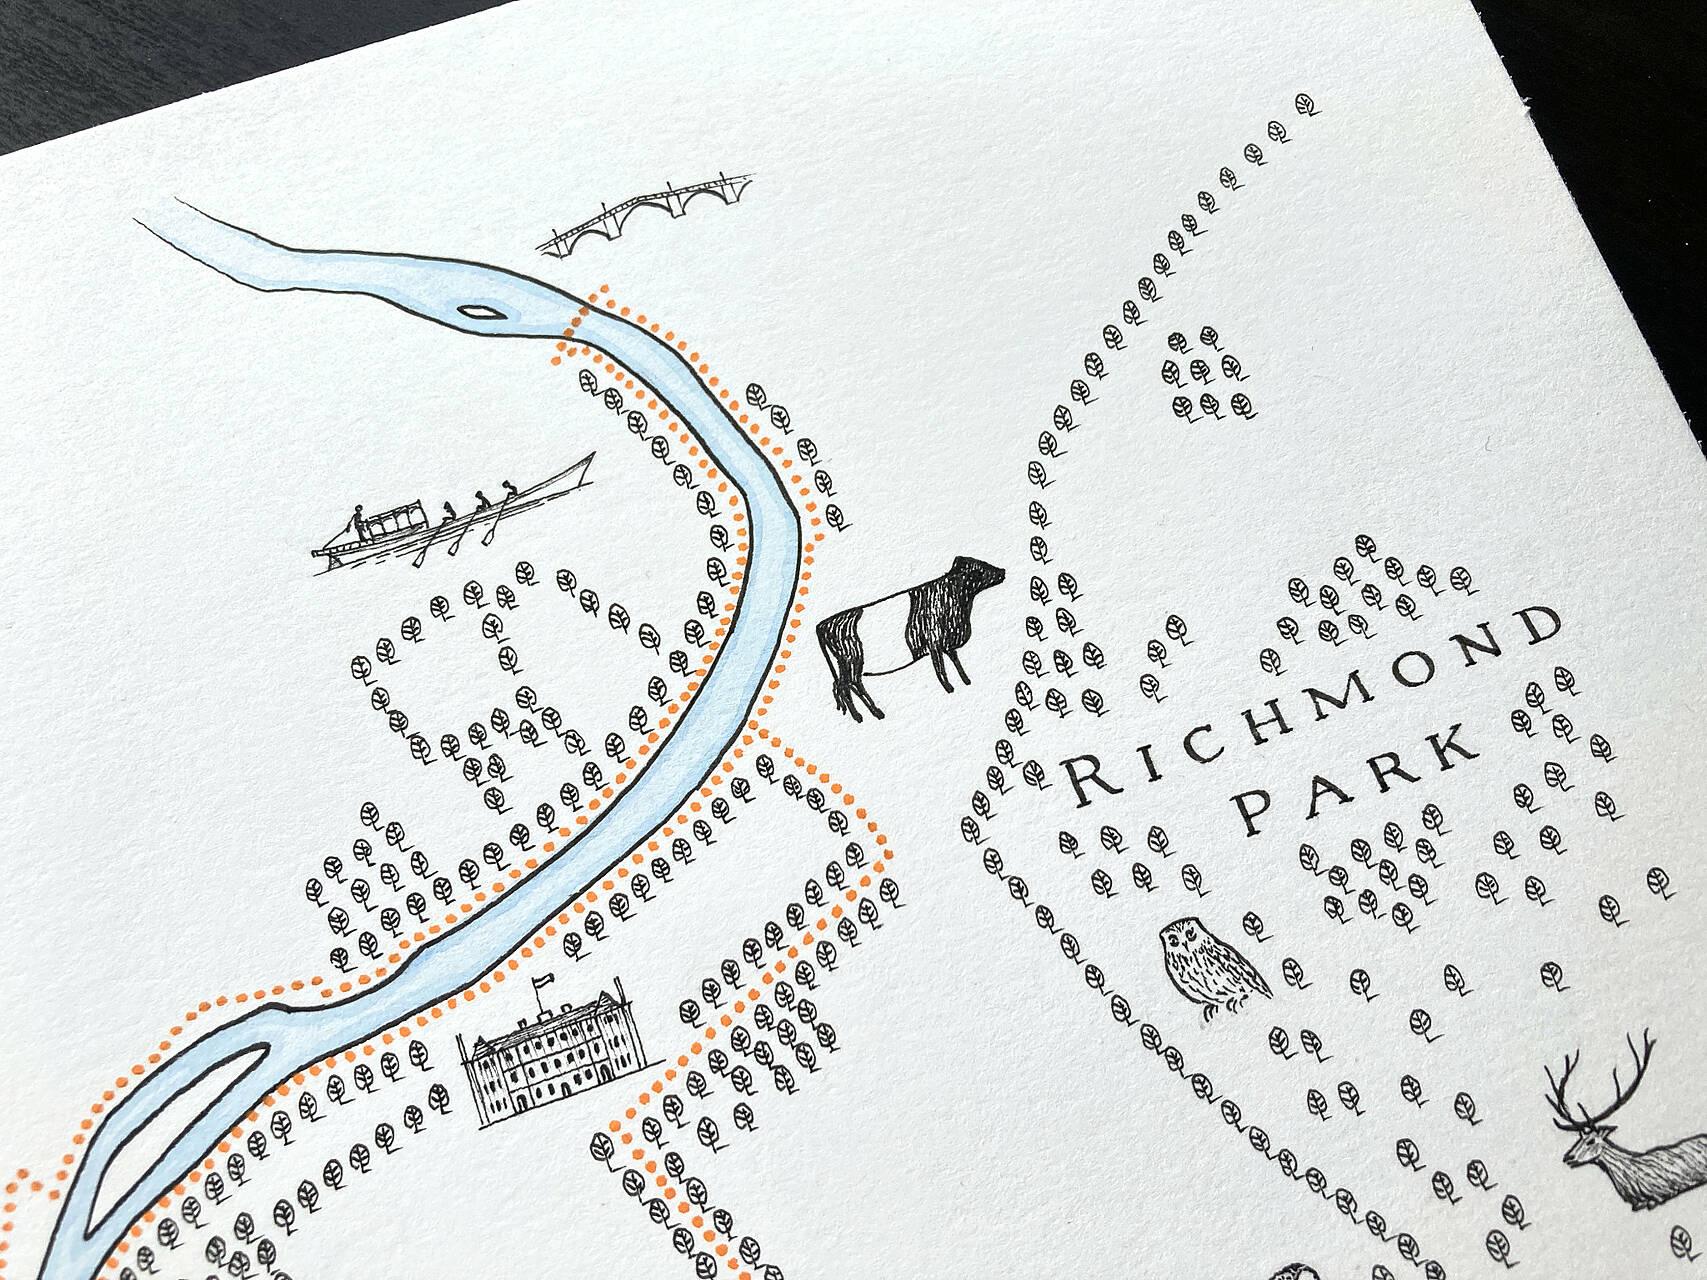 commission -Kingston, Richmond, Bushy and the River -Ben -zoom 2.jpg